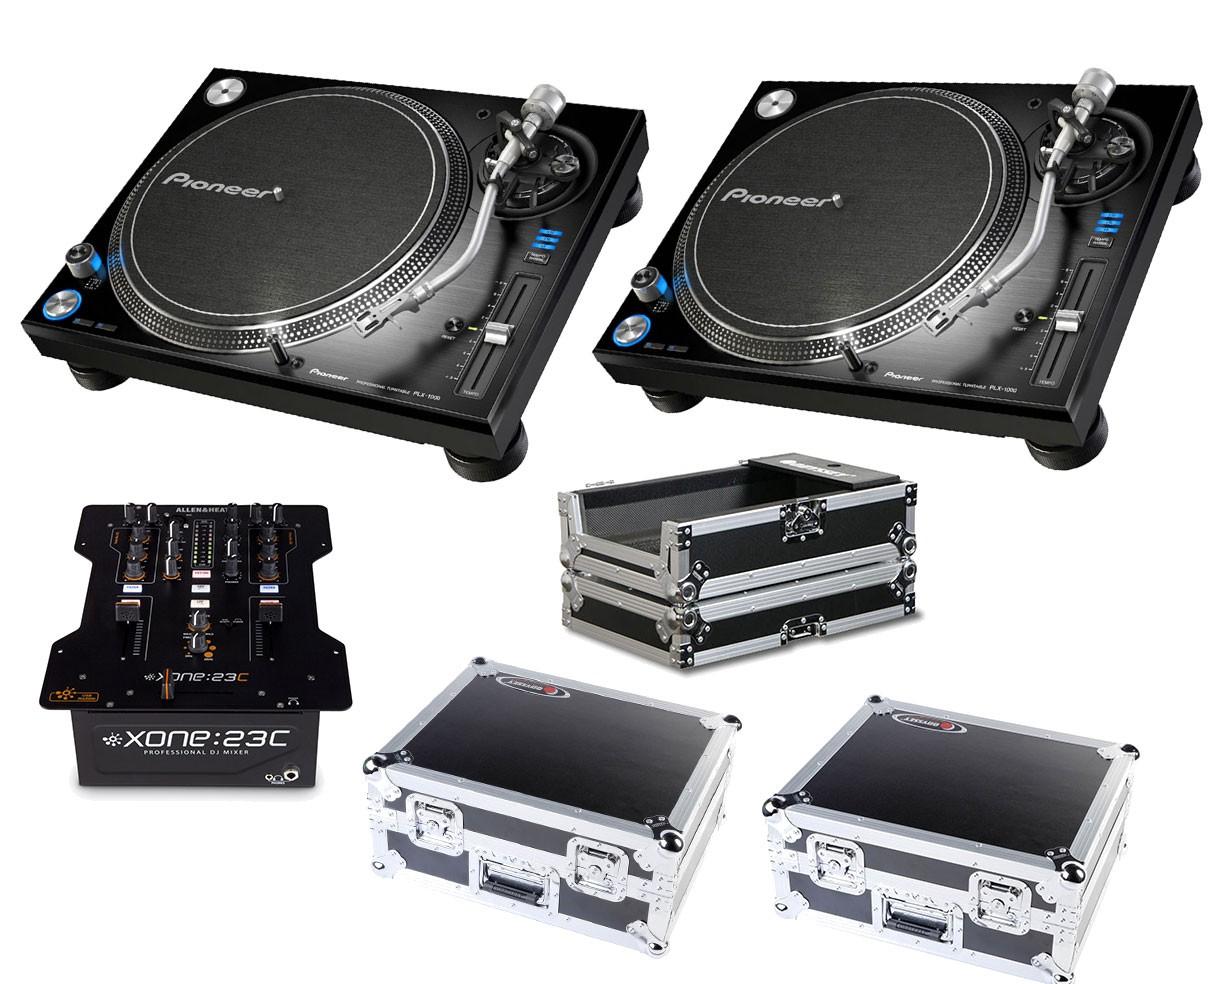 2x Pioneer PLX-1000 + Xone:23C + Odyssey Cases